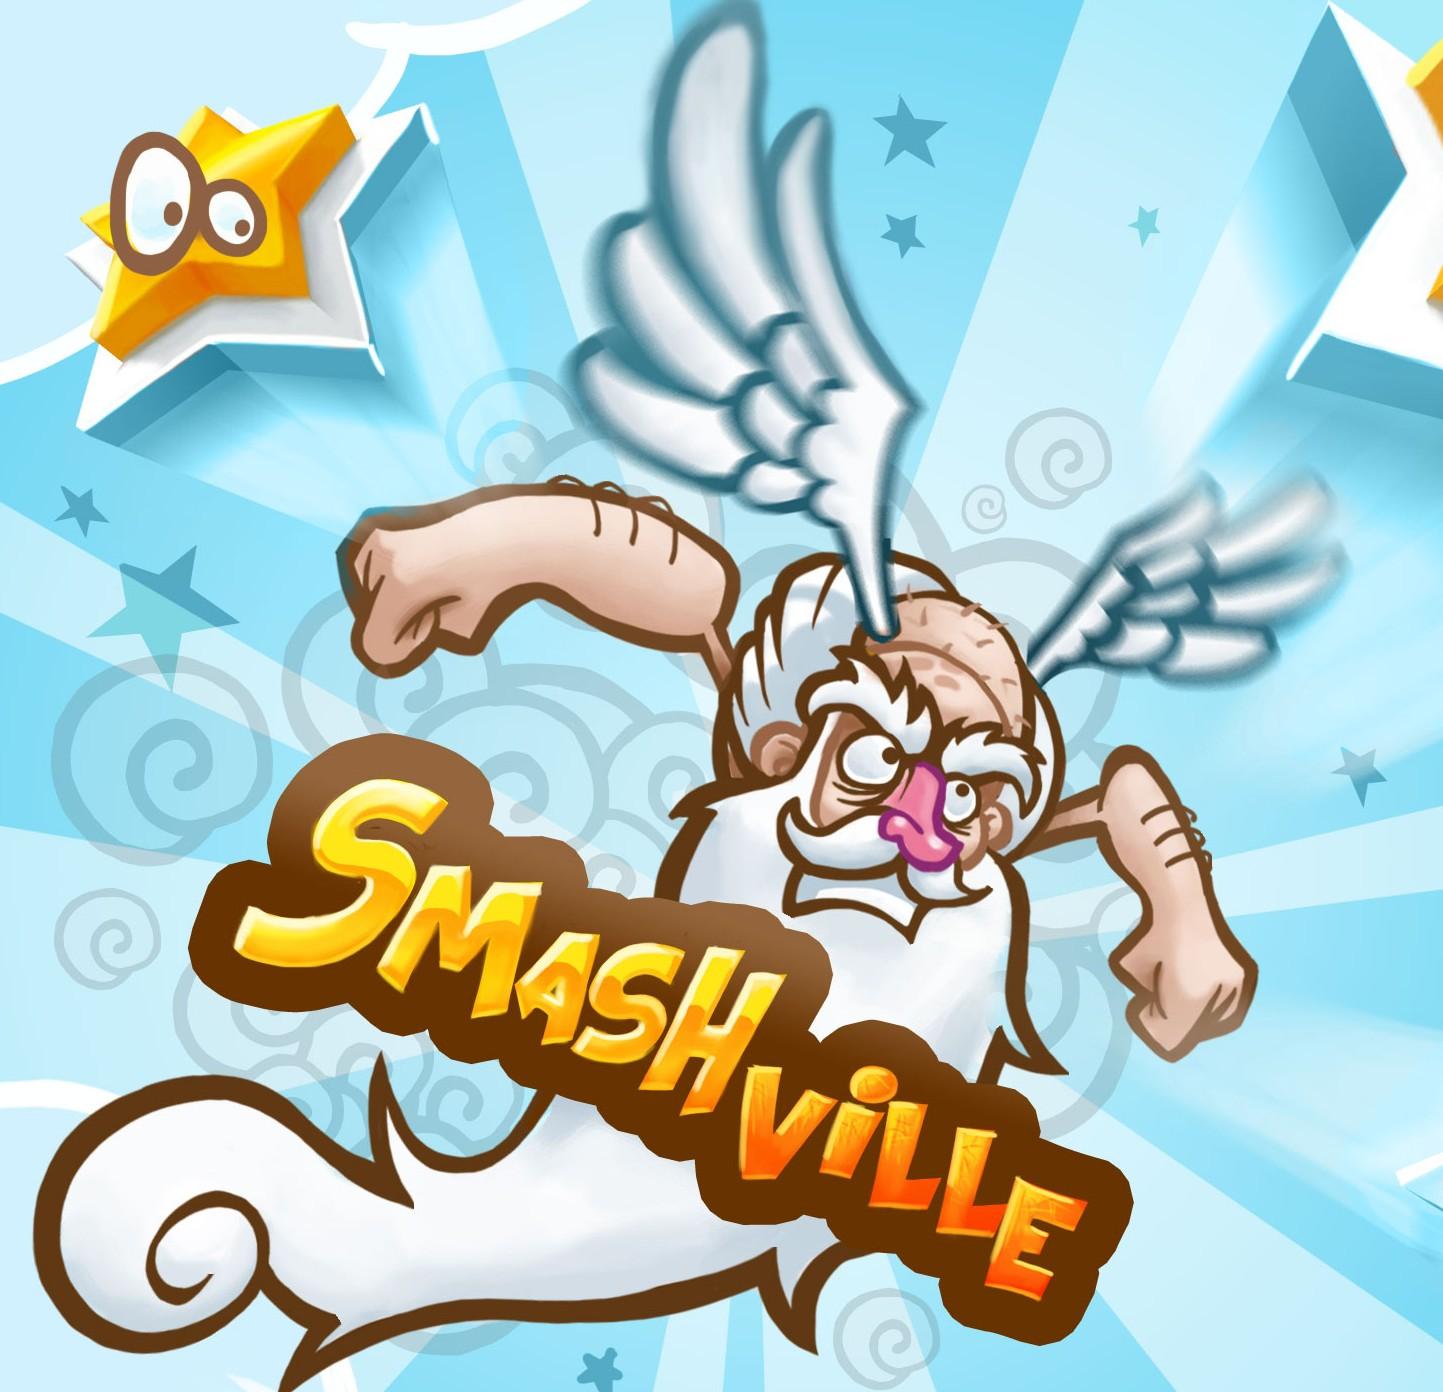 Smashville (2012)